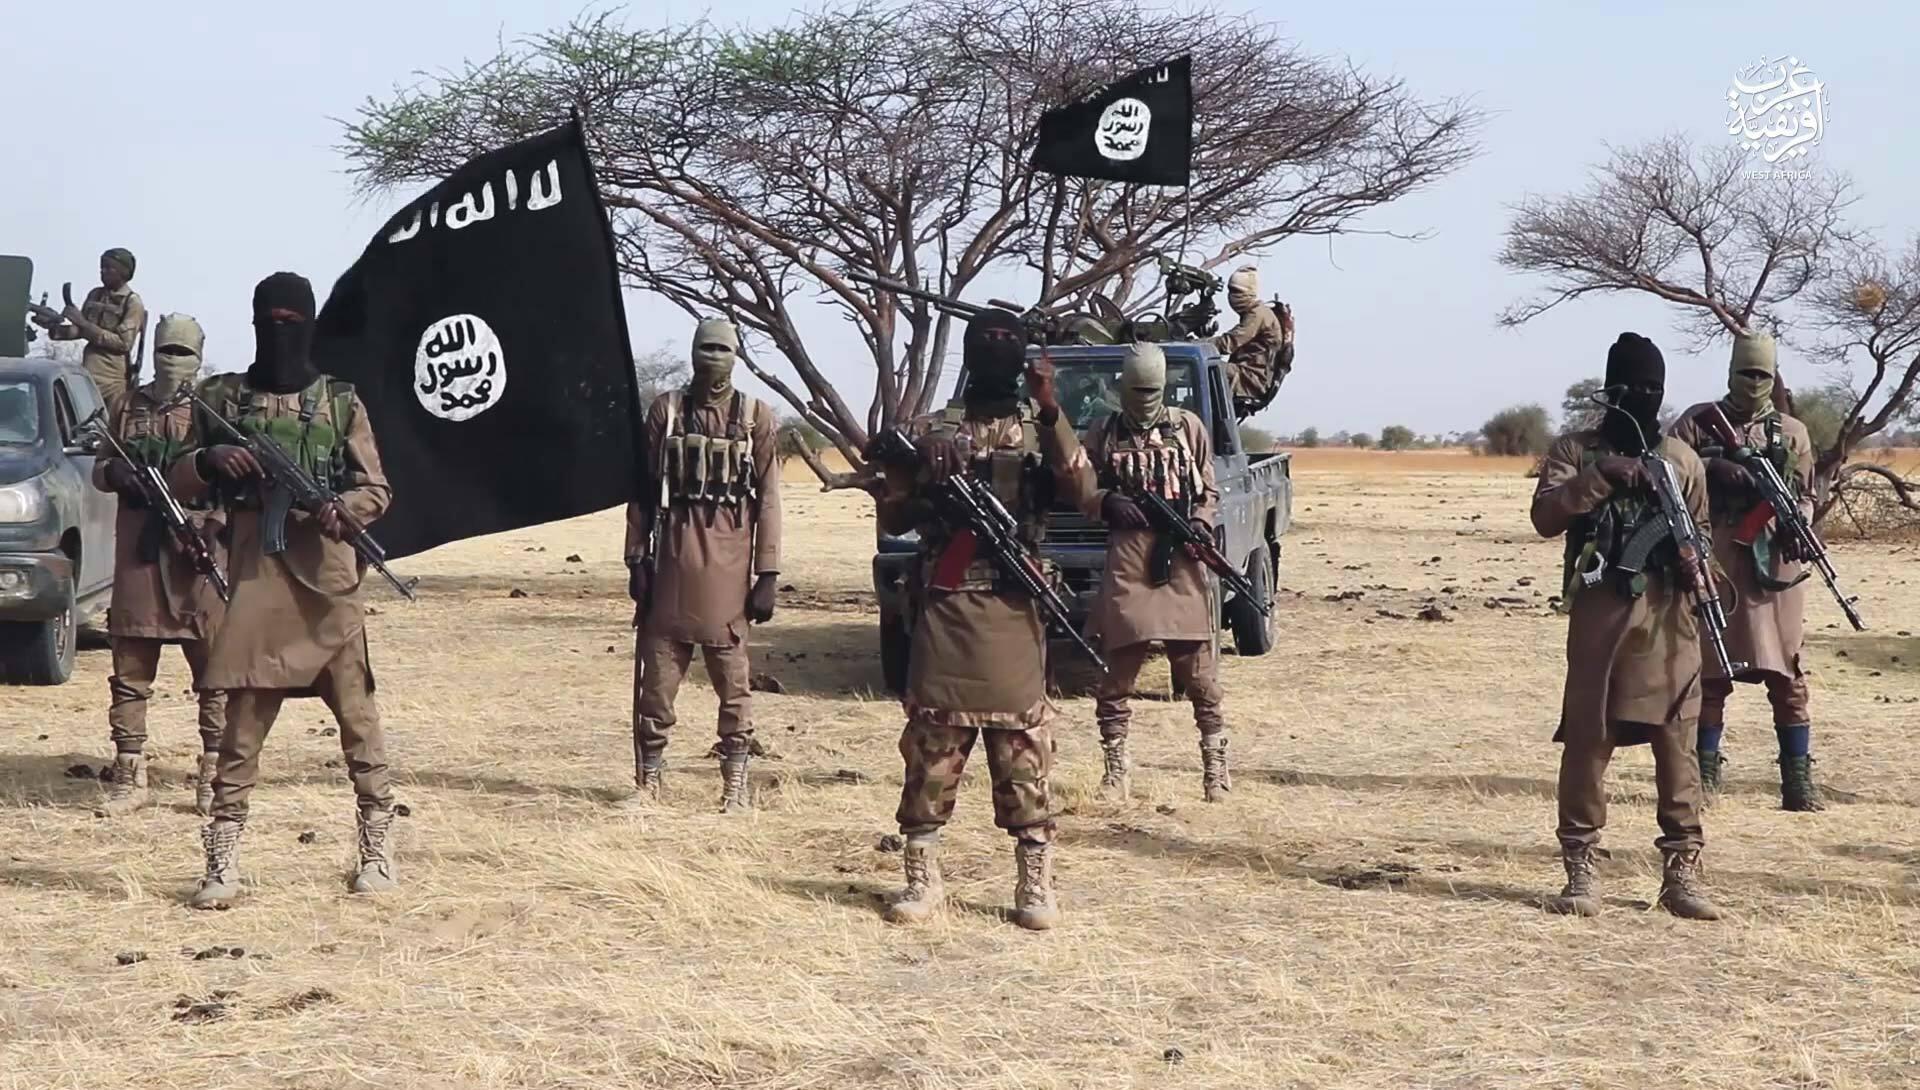 Natale di sangue in Nigeria: jihadisti uccidono 7 cristiani